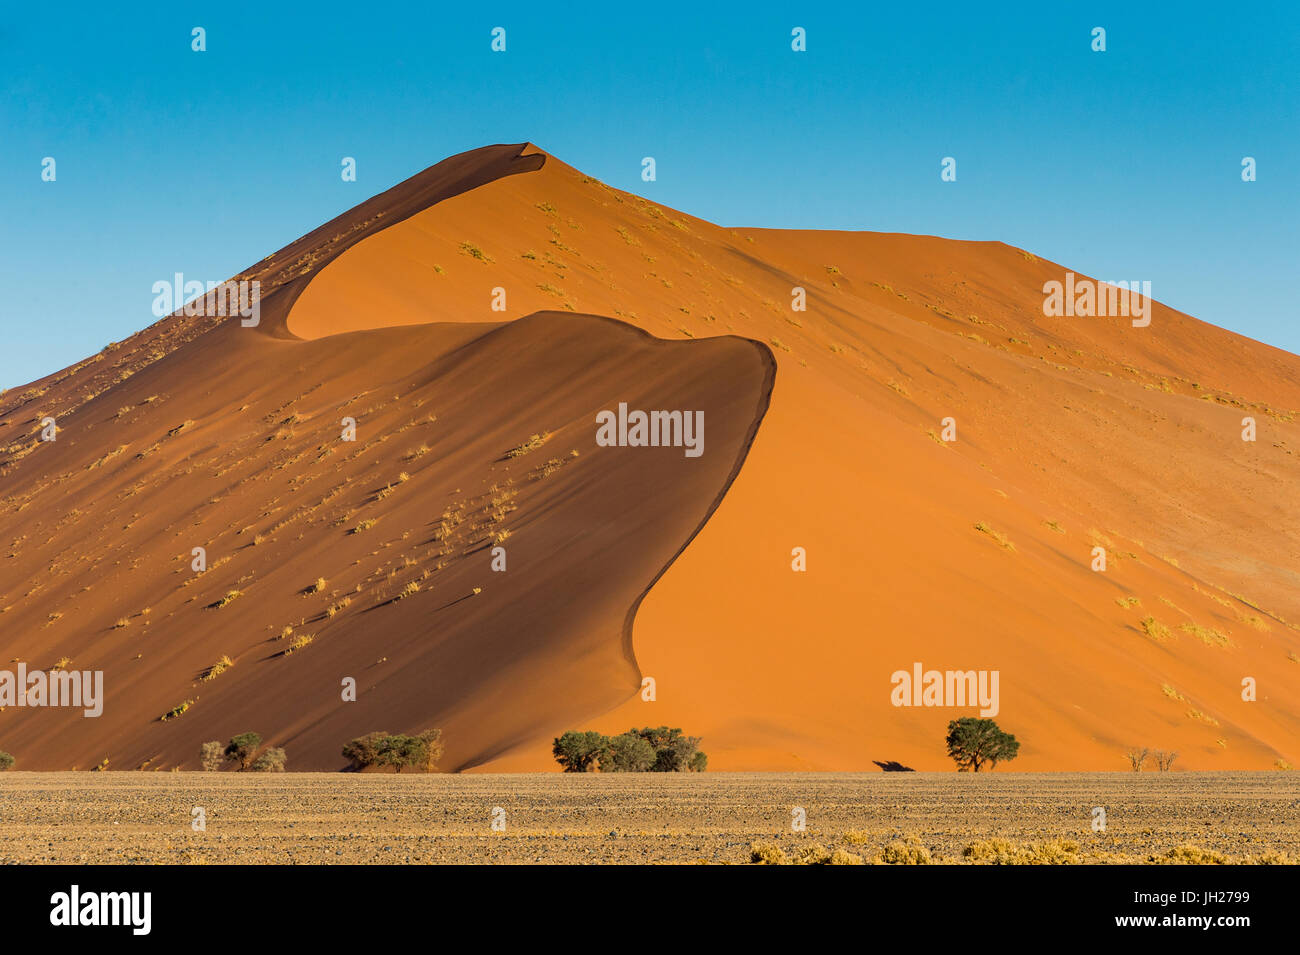 Giant Sand Dune 45, Sossusvlei, Namib-Naukluft National Park, Namibia, Africa Stock Photo